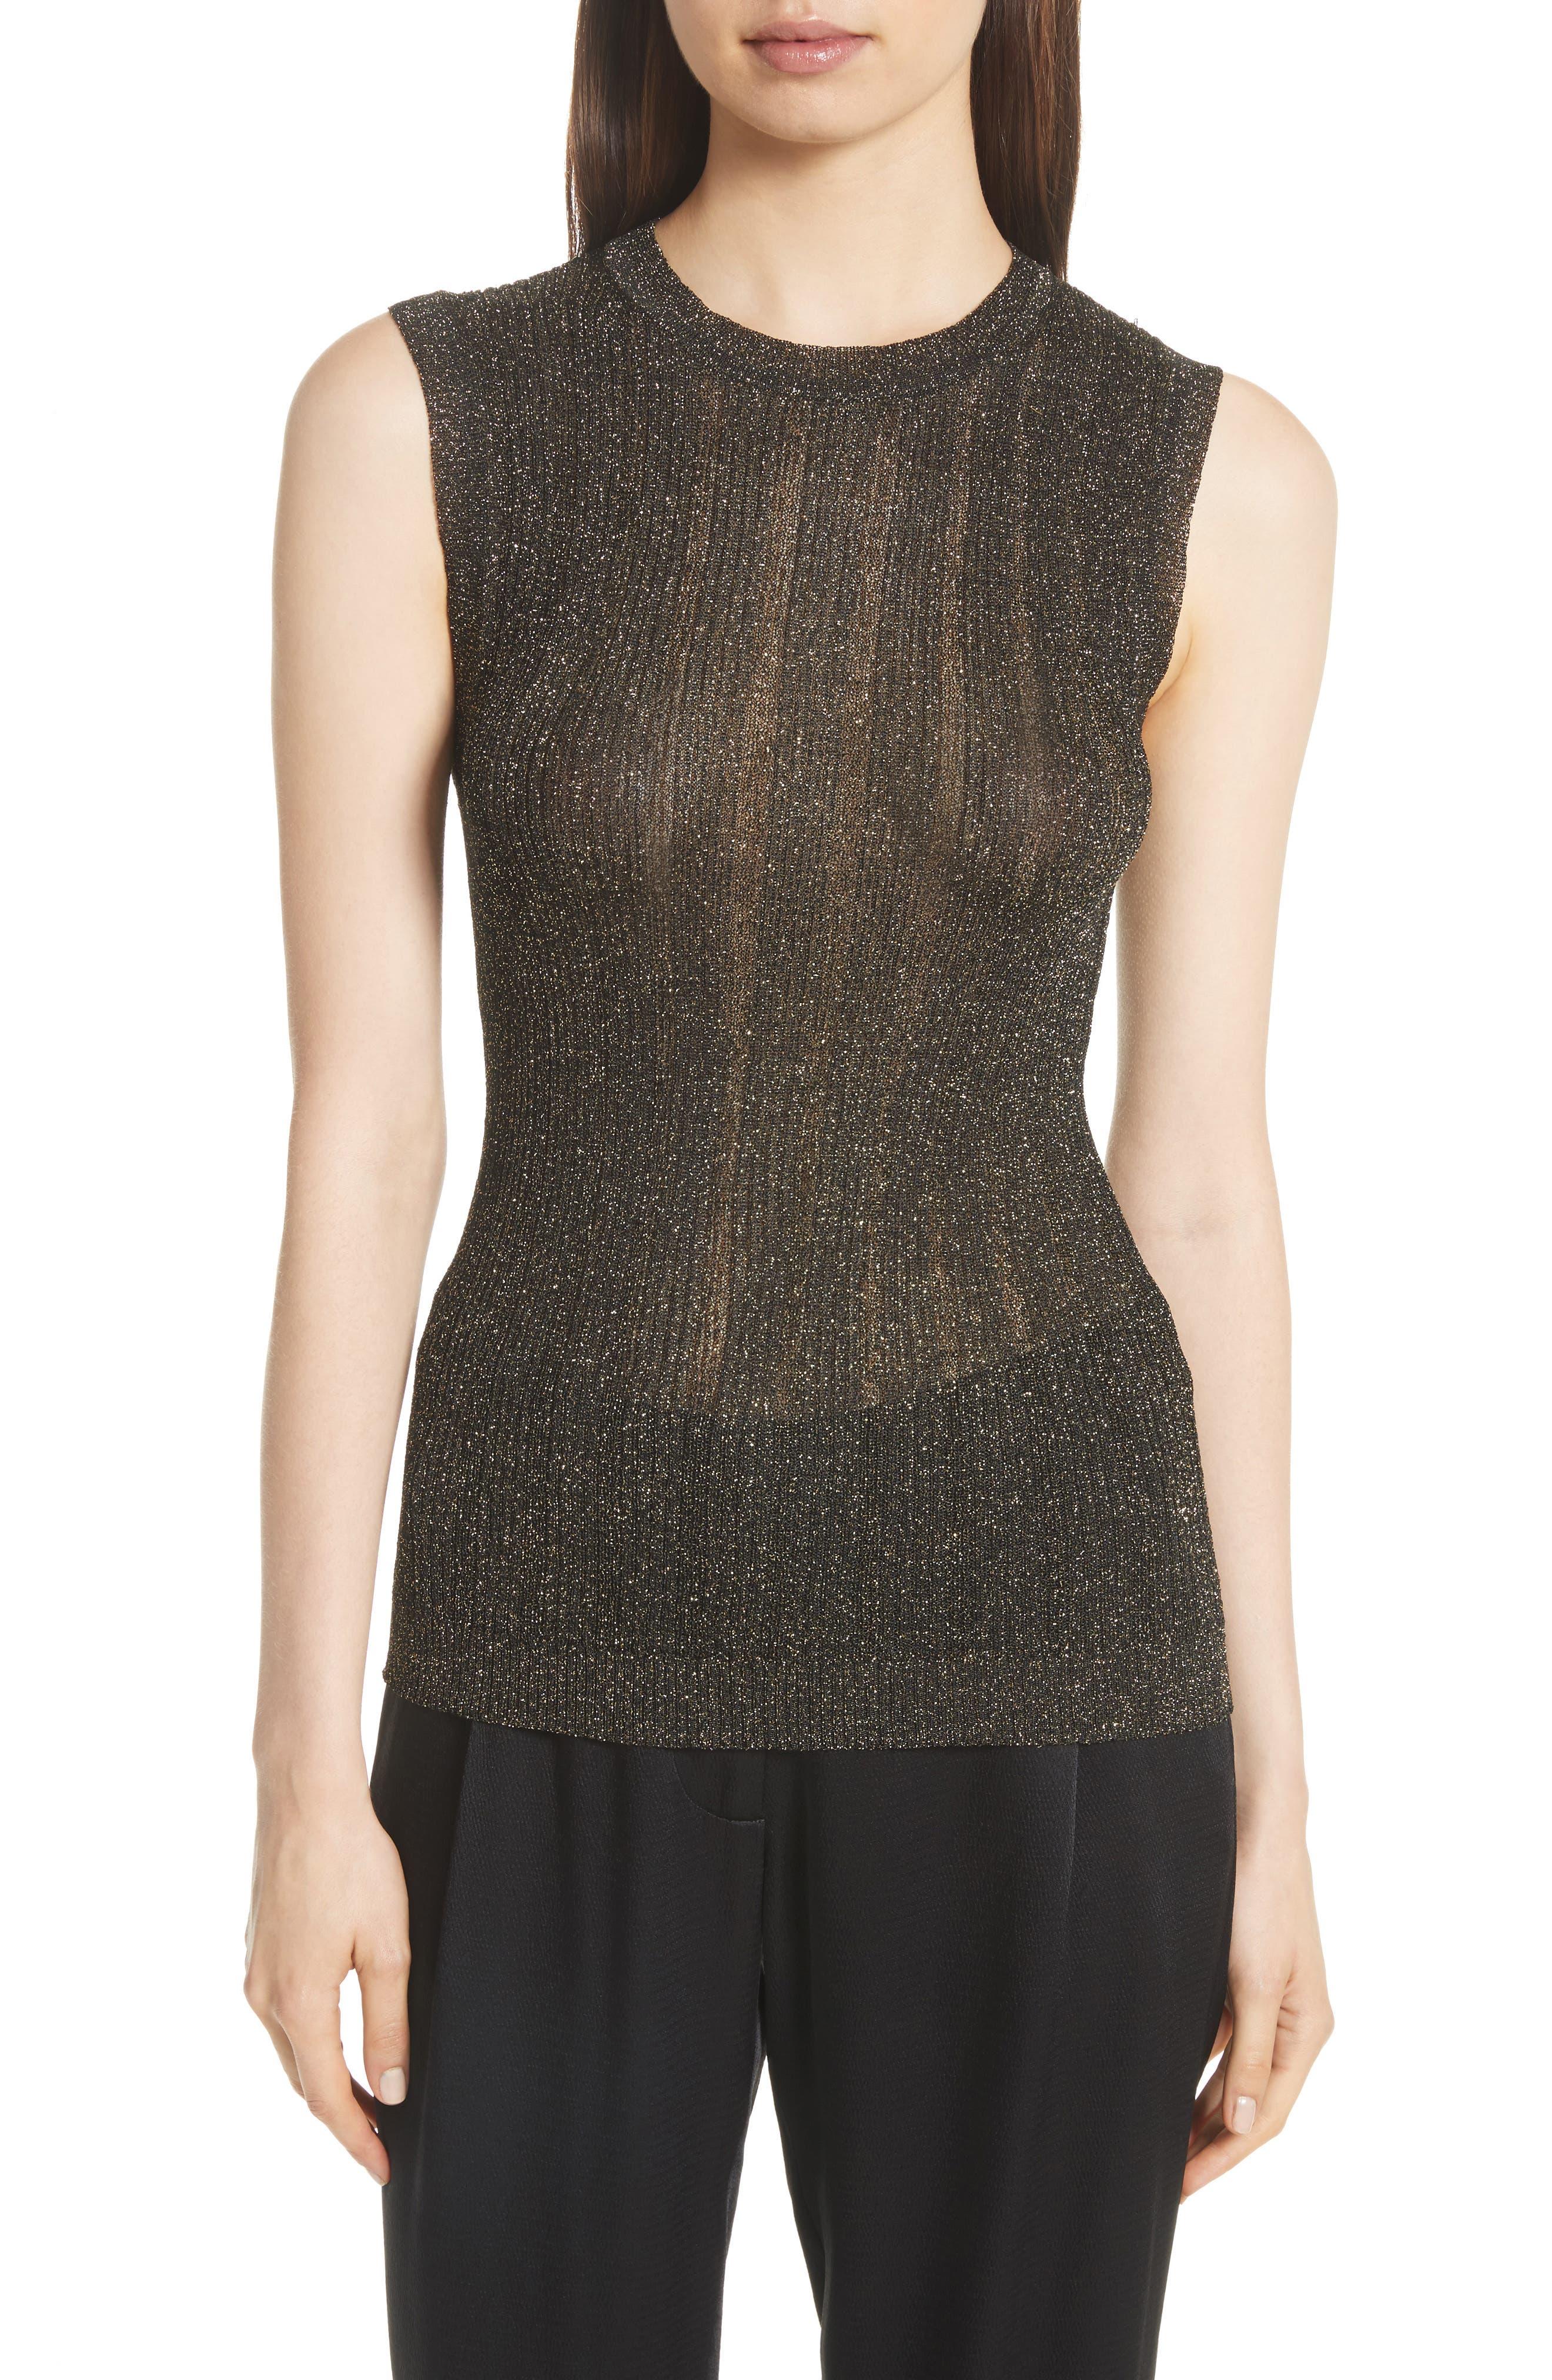 Main Image - Nili Lotan Lace Metallic Knit Top